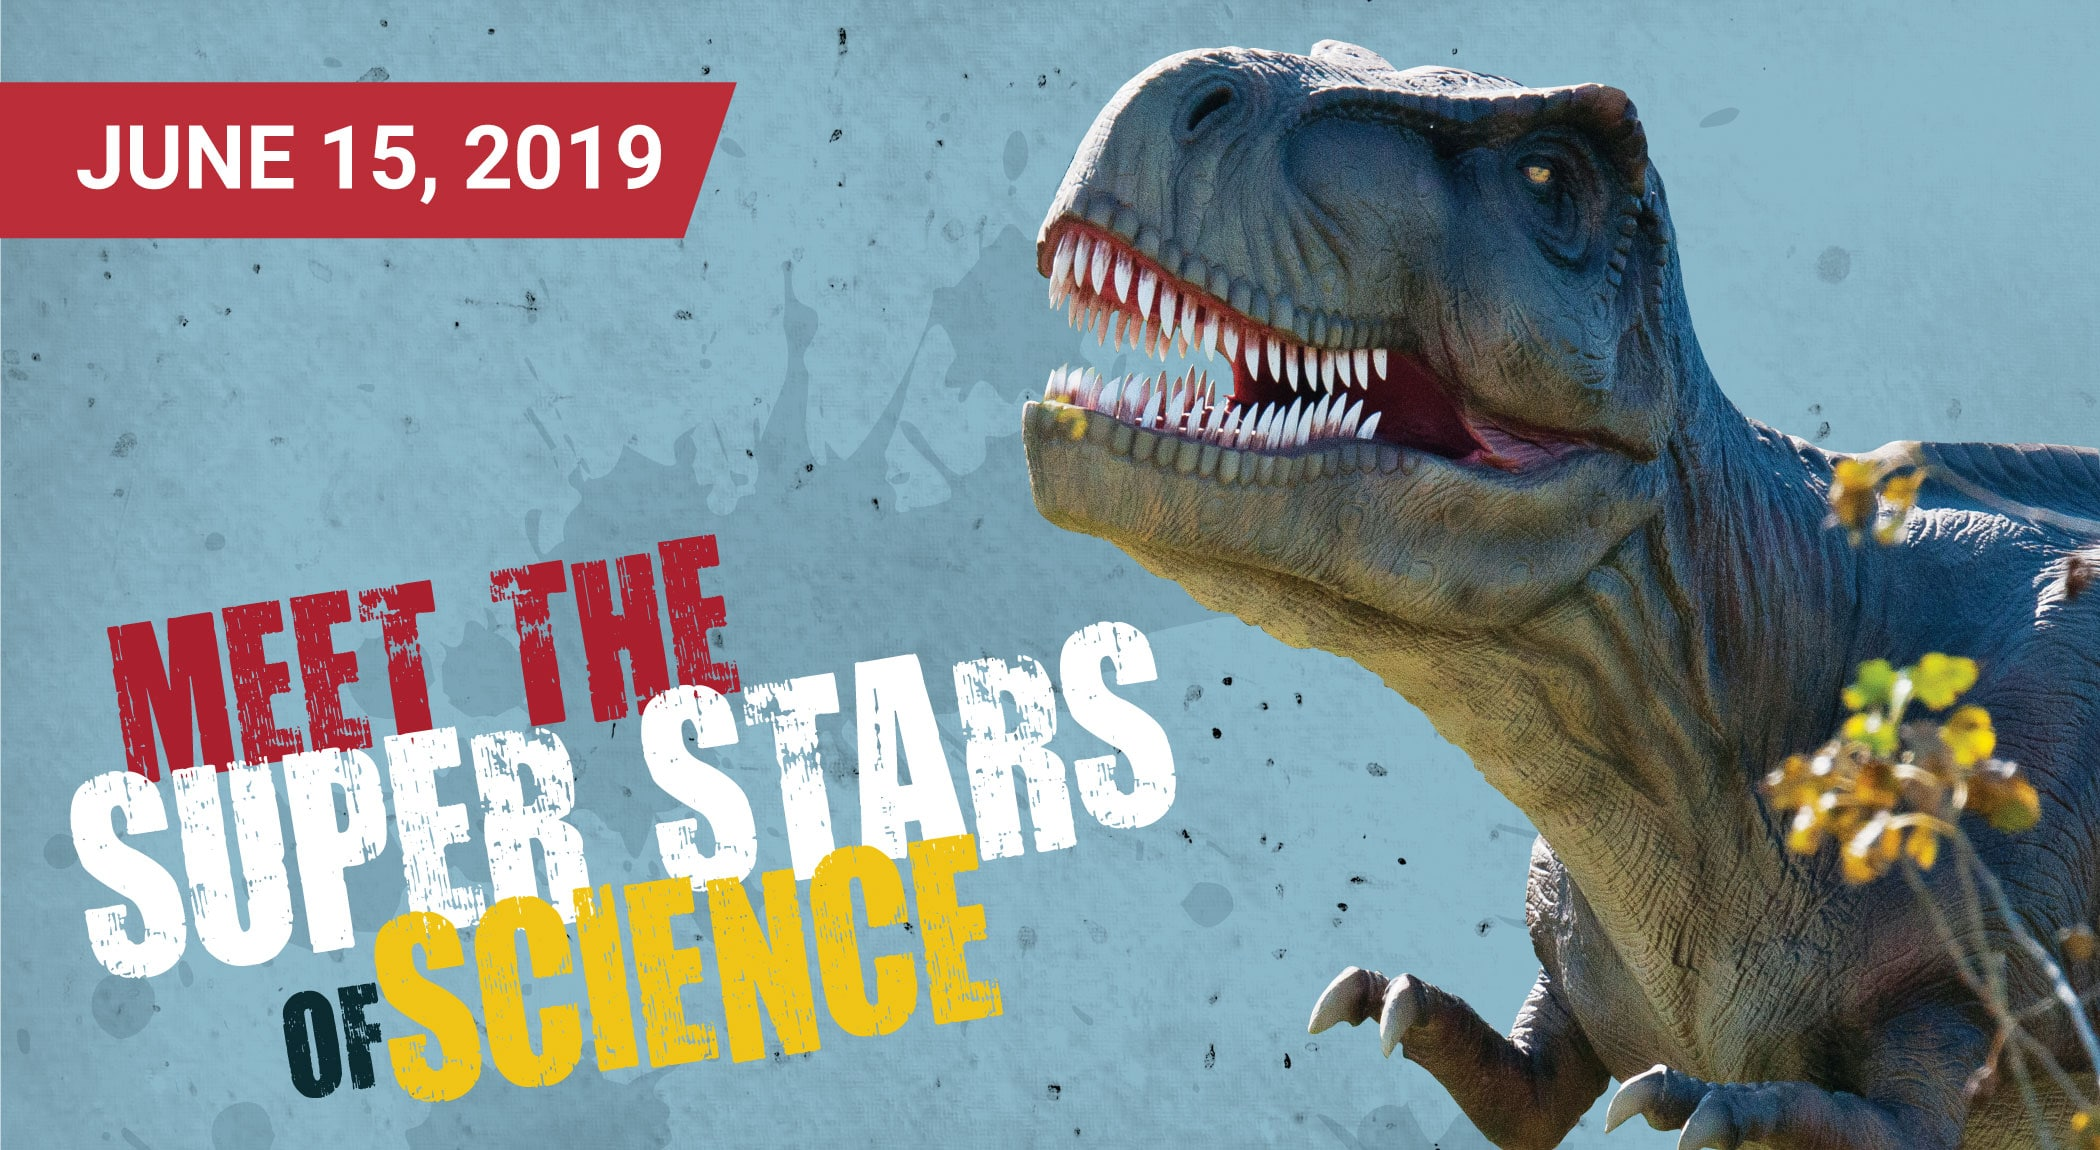 Super Stars of Science - June 15